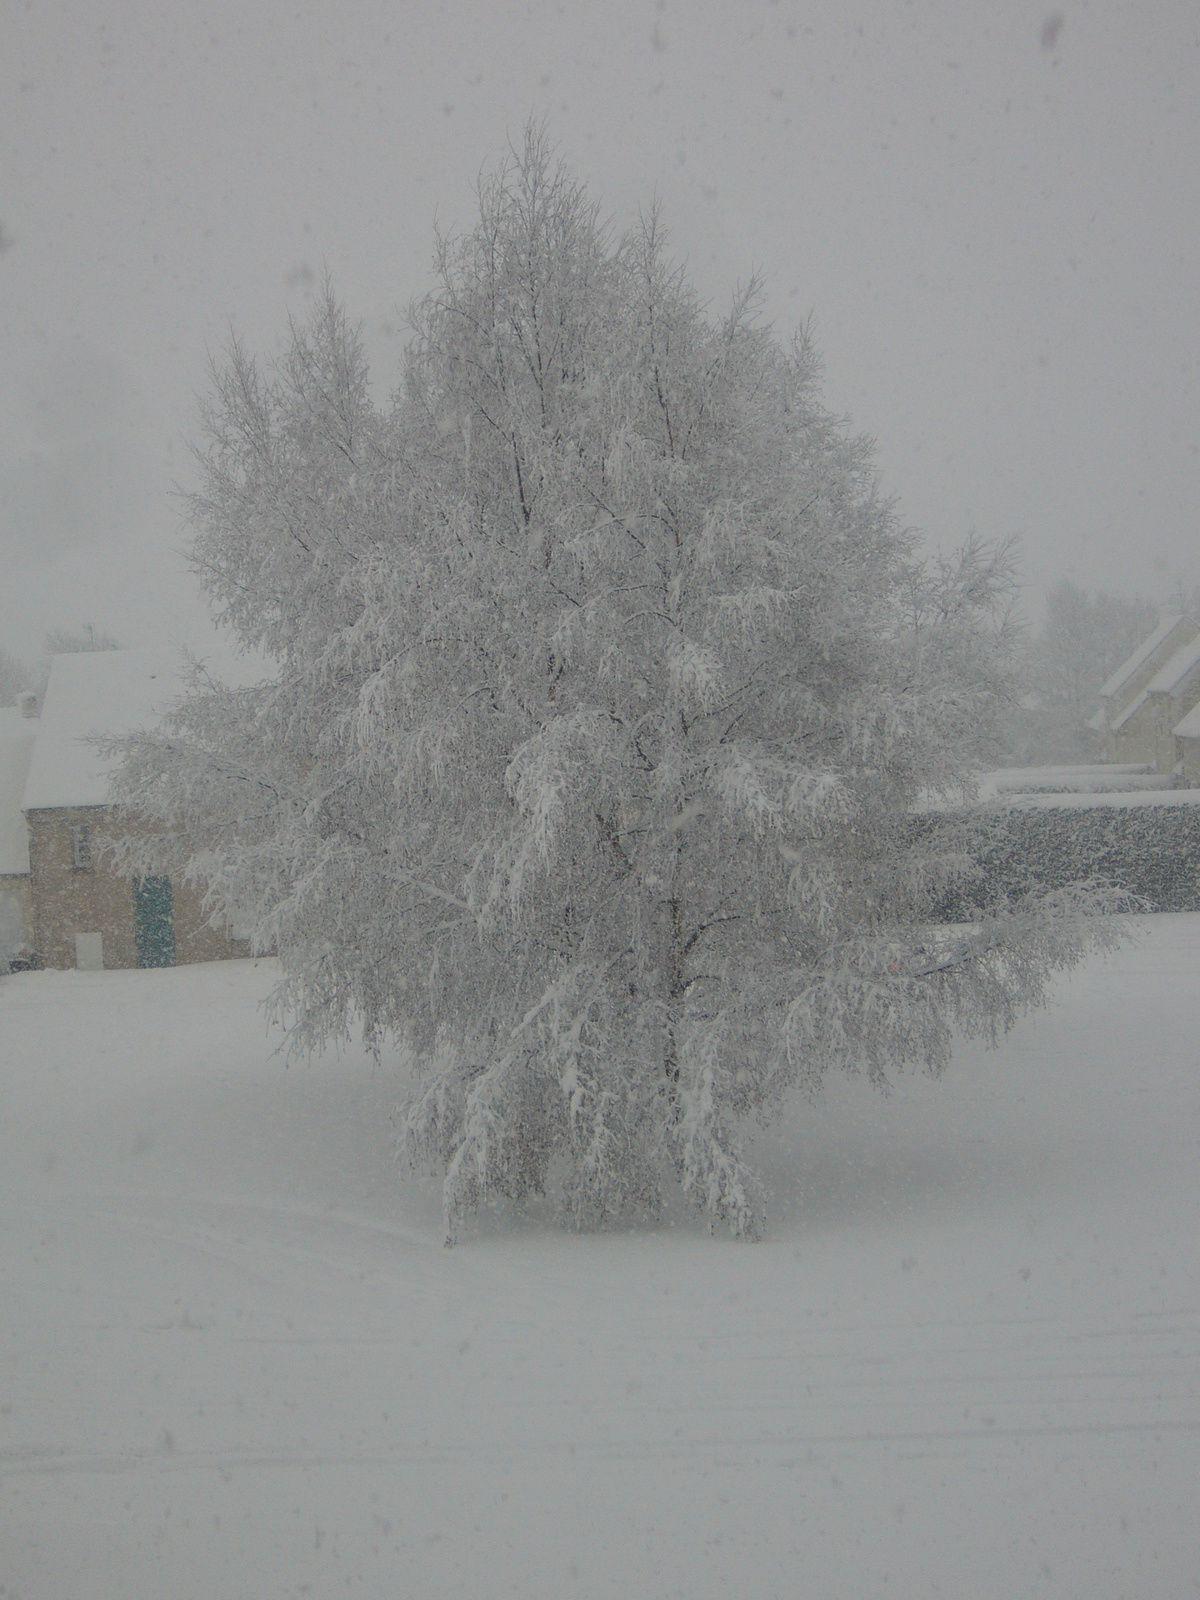 8 Janvier 2010 en Normandie…